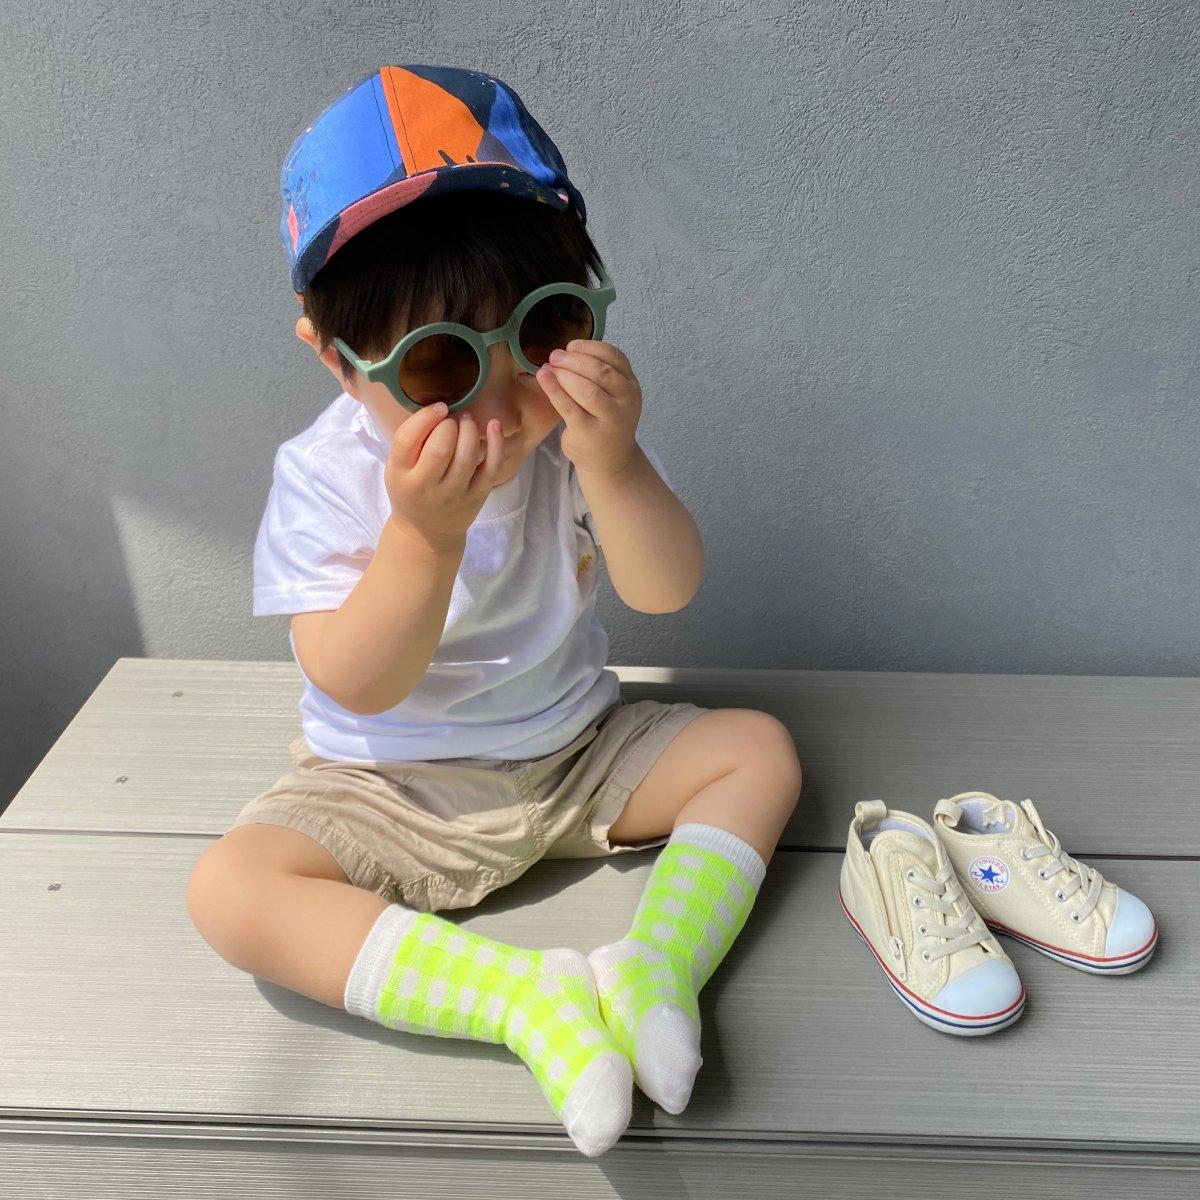 【KIDS】Kids Colorful Sunglasses 詳細画像13